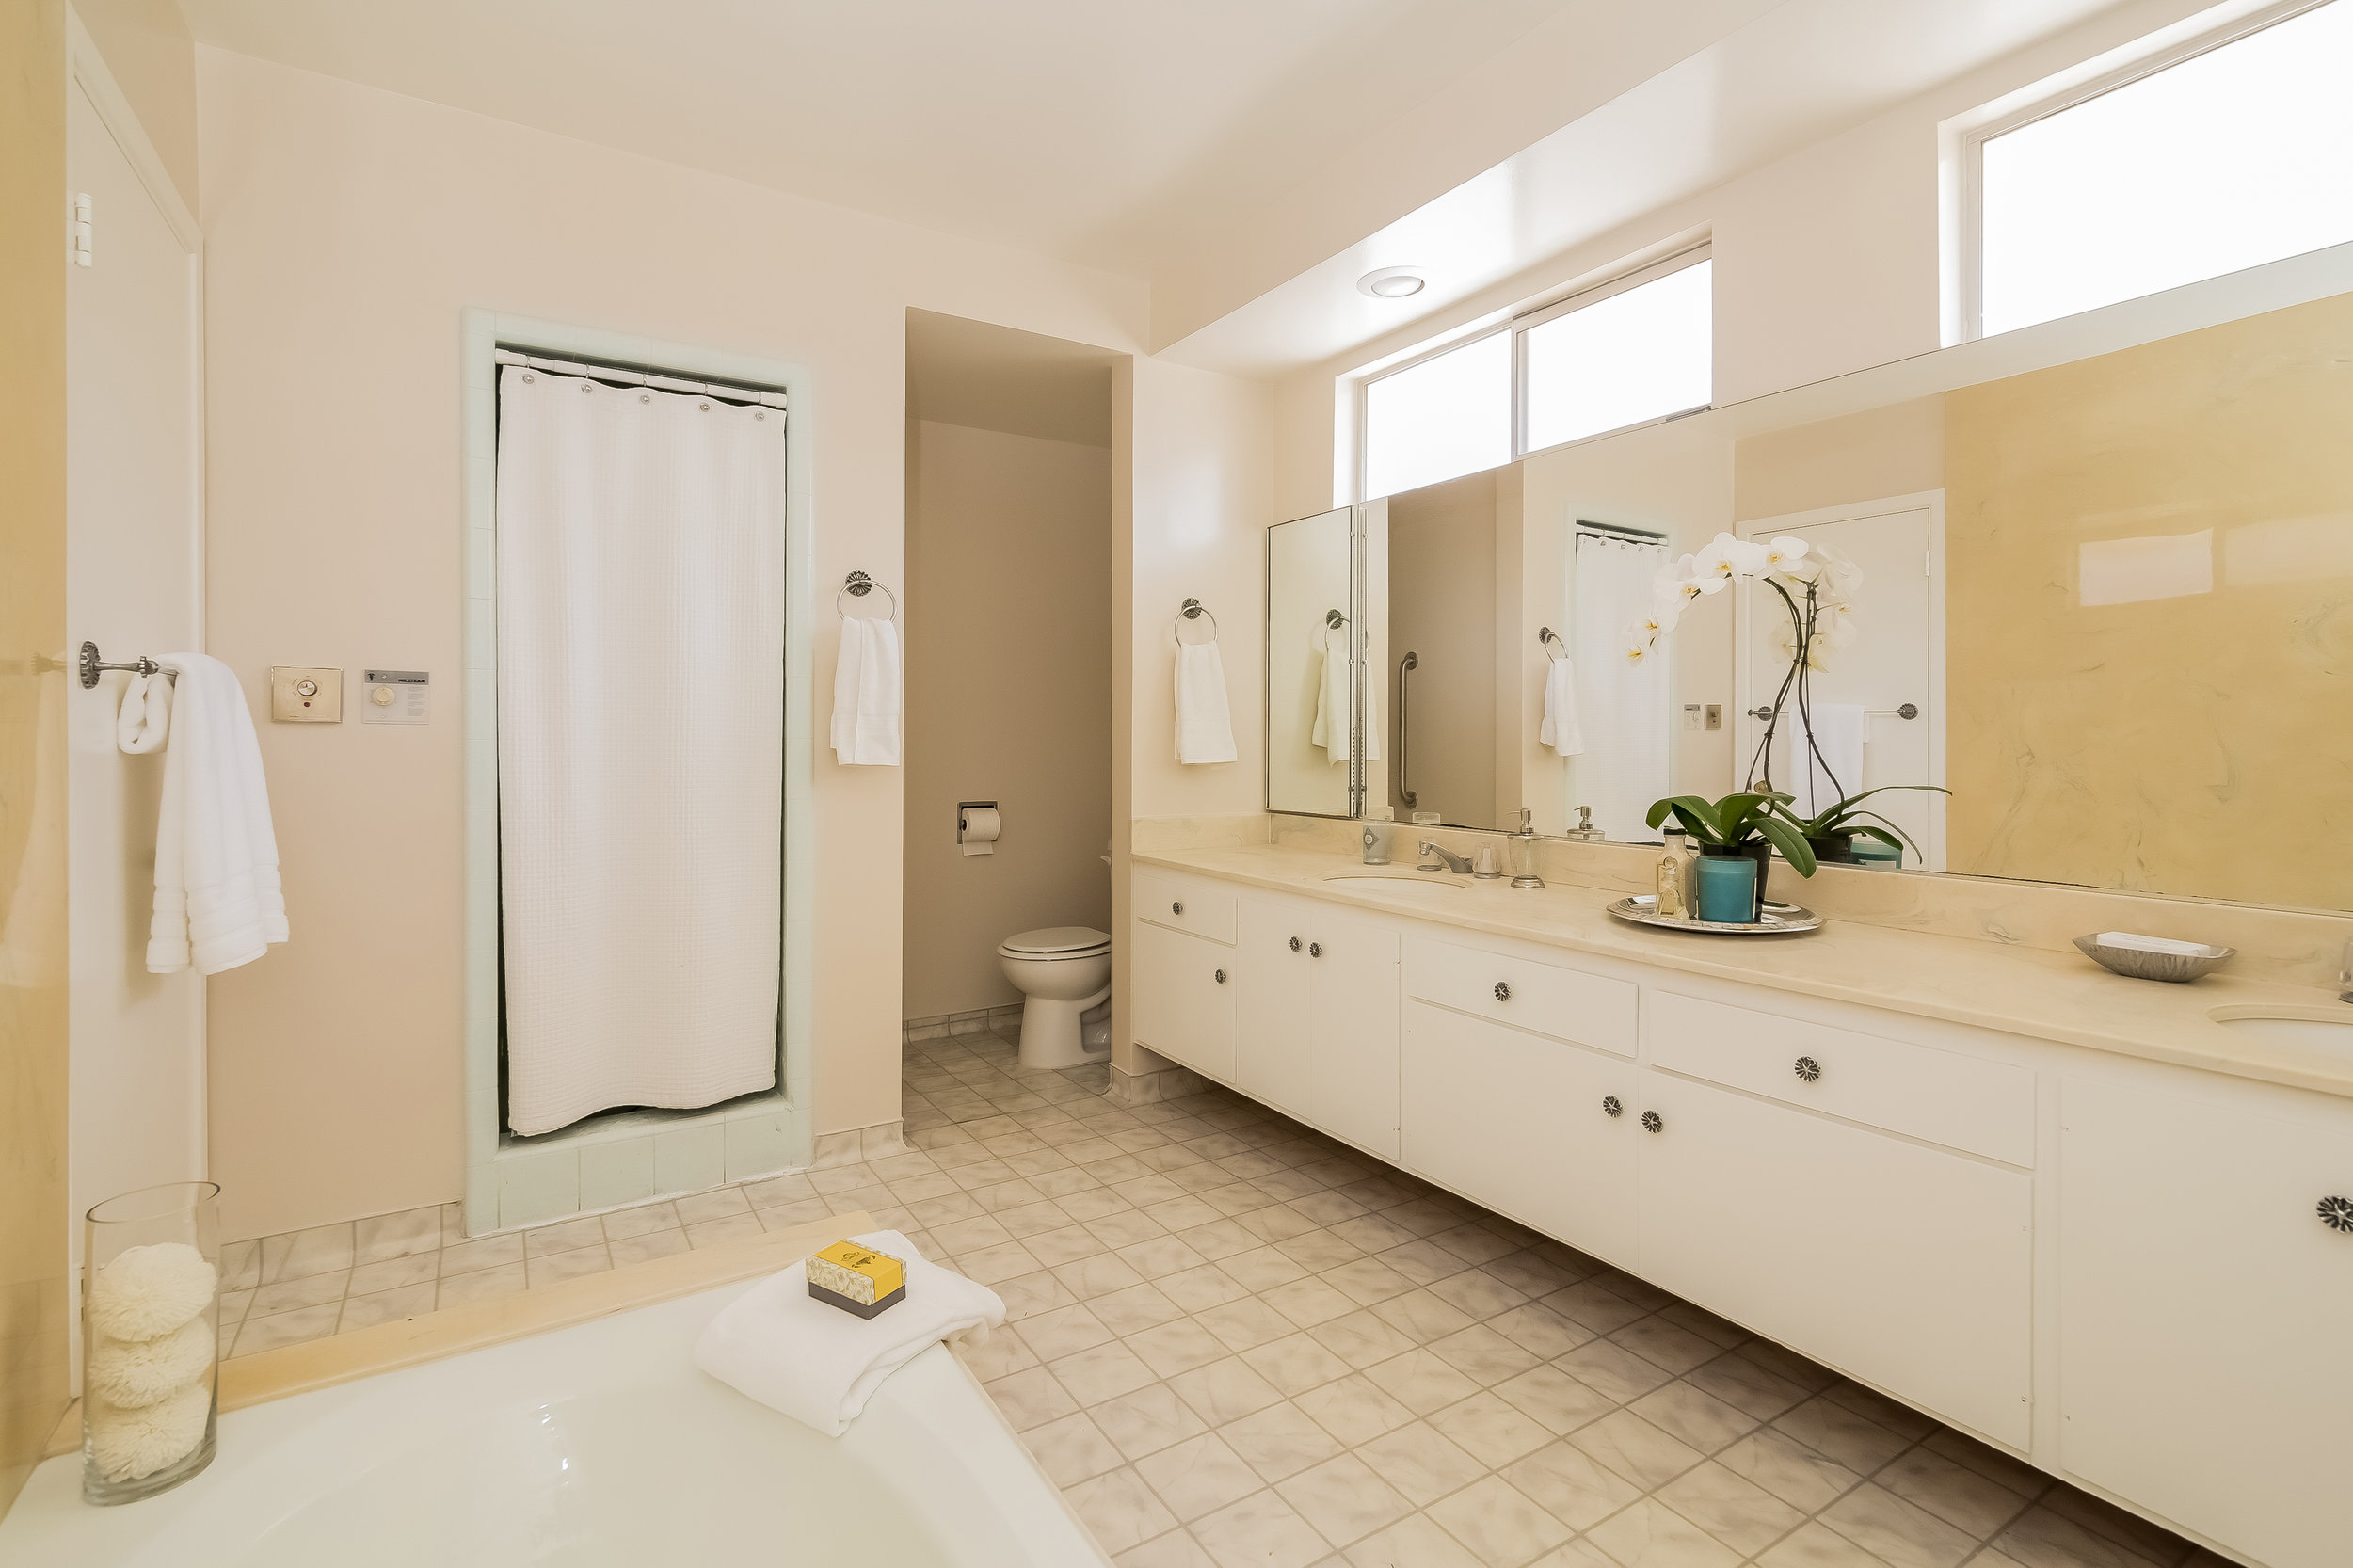 028-Master_Bathroom-2805391-large copy.jpg